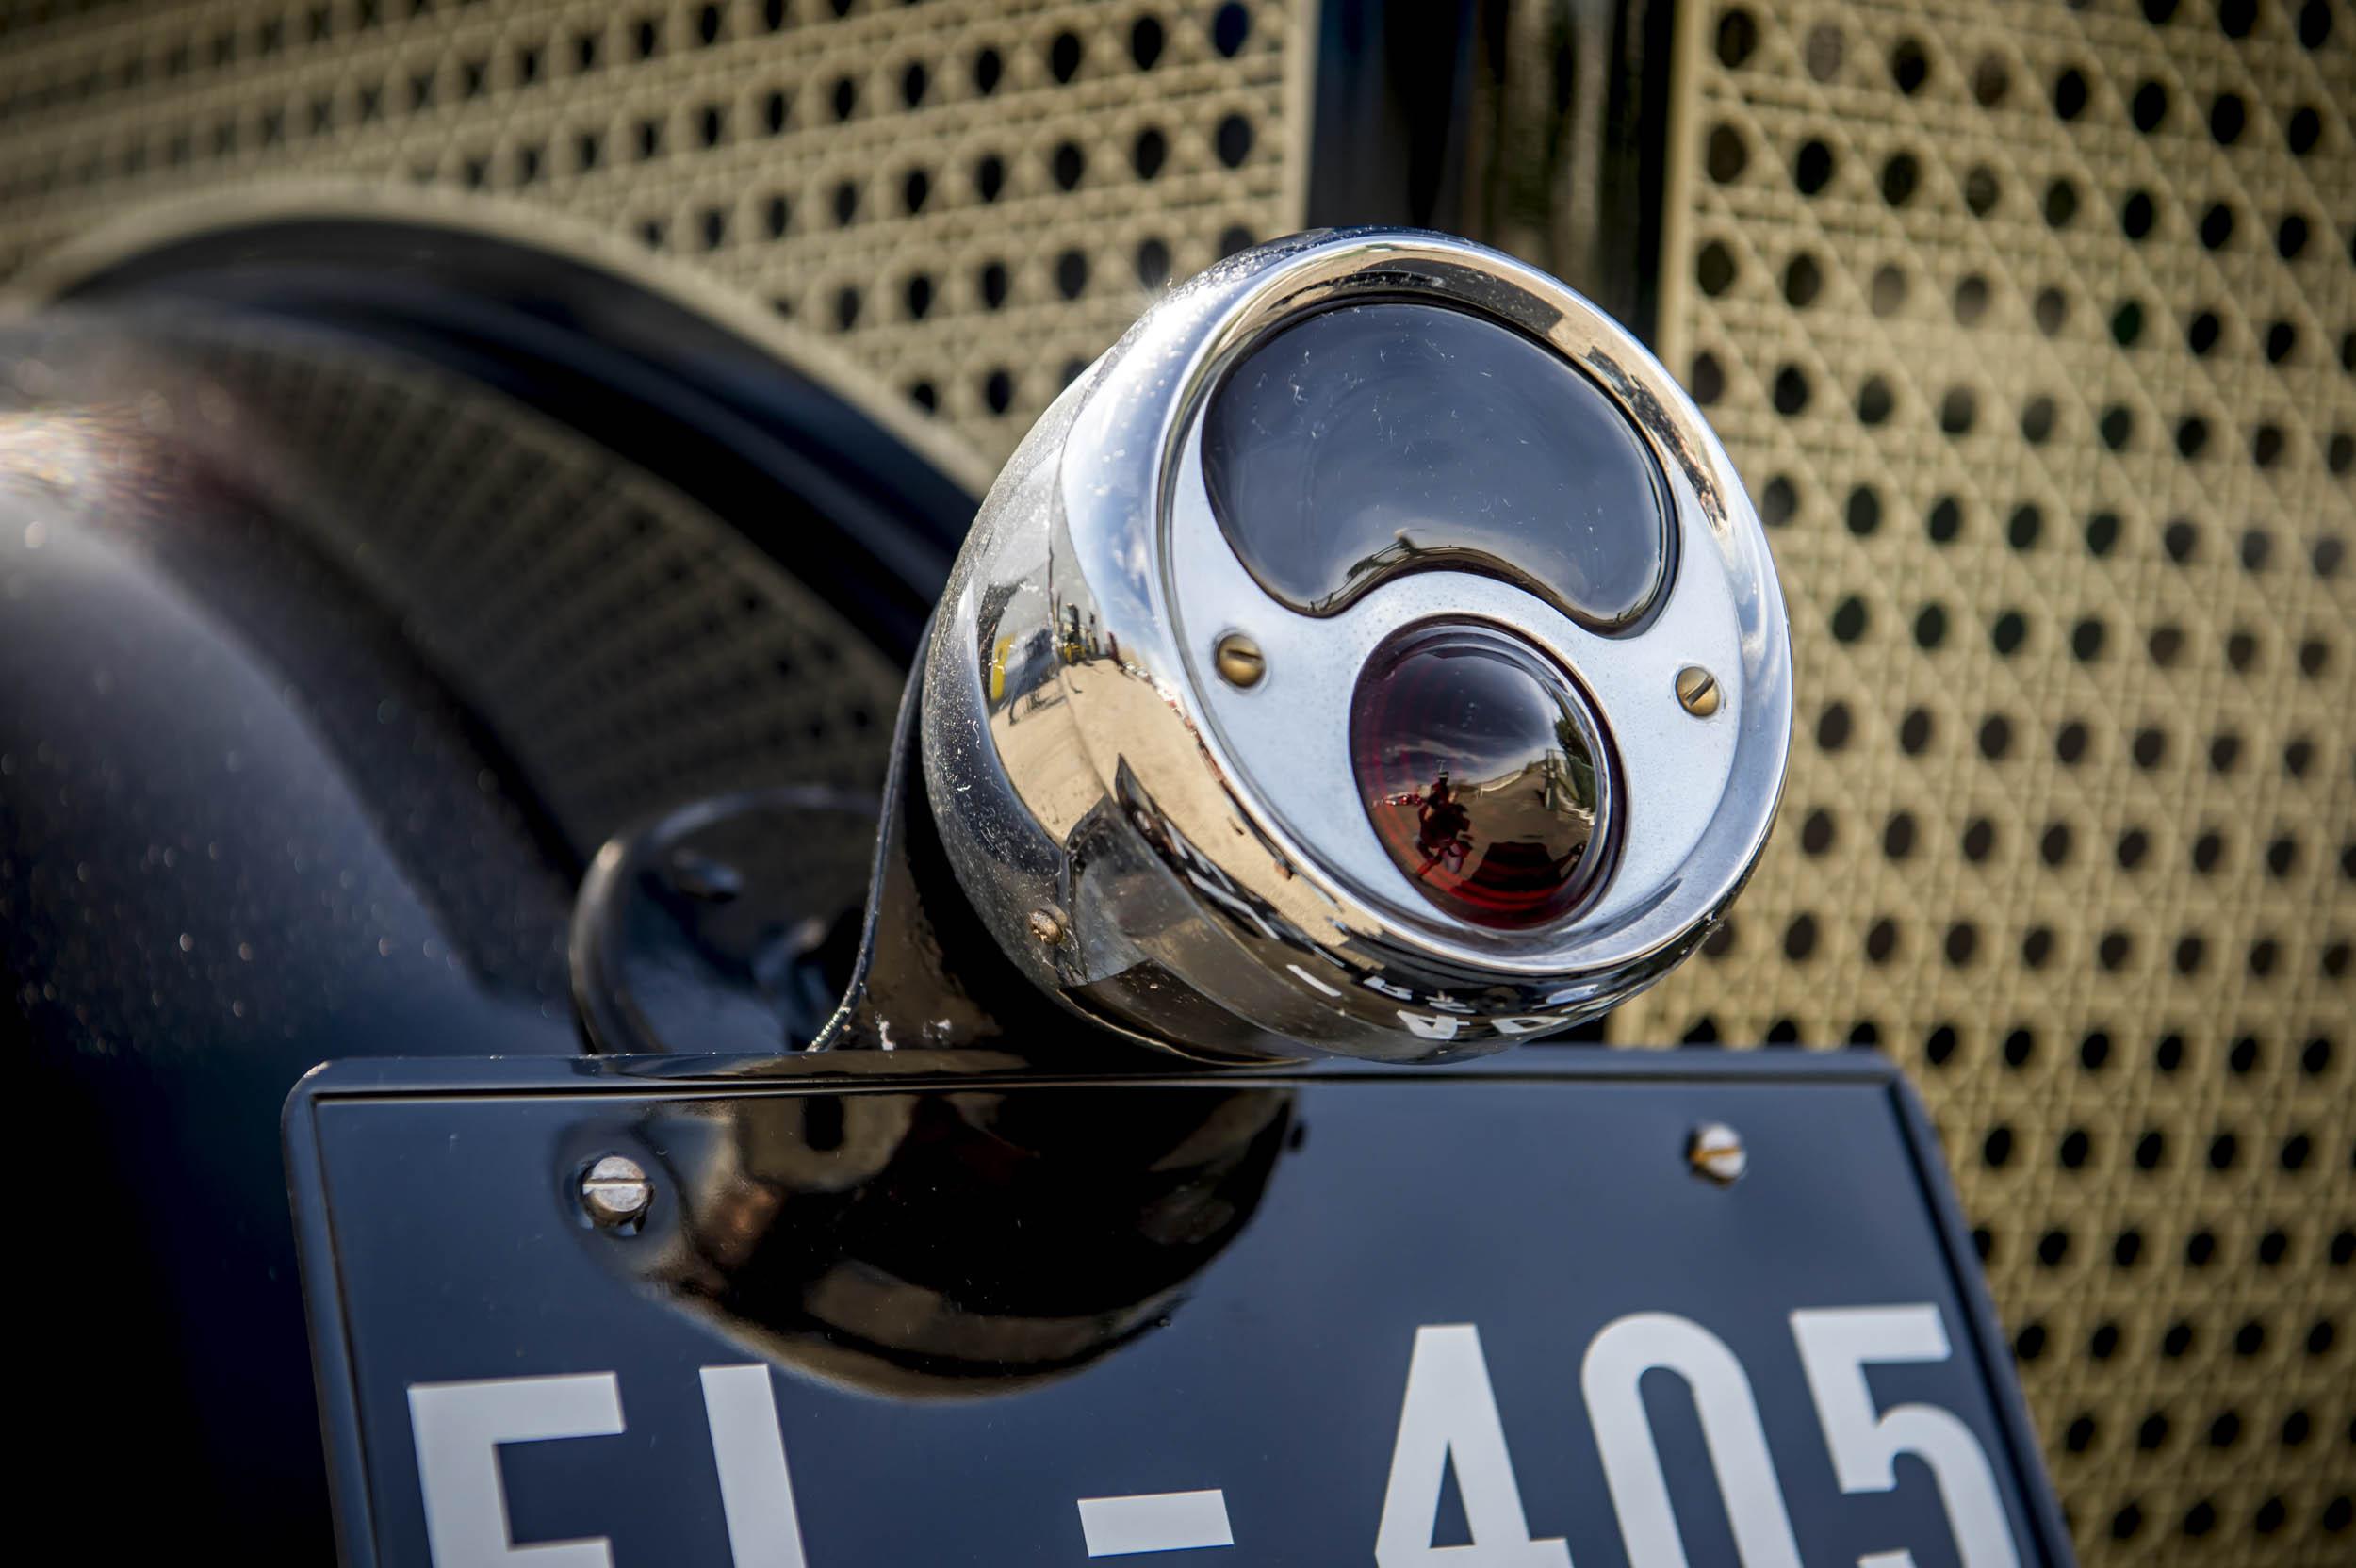 1929 renault nervastella coupe de ville license plate